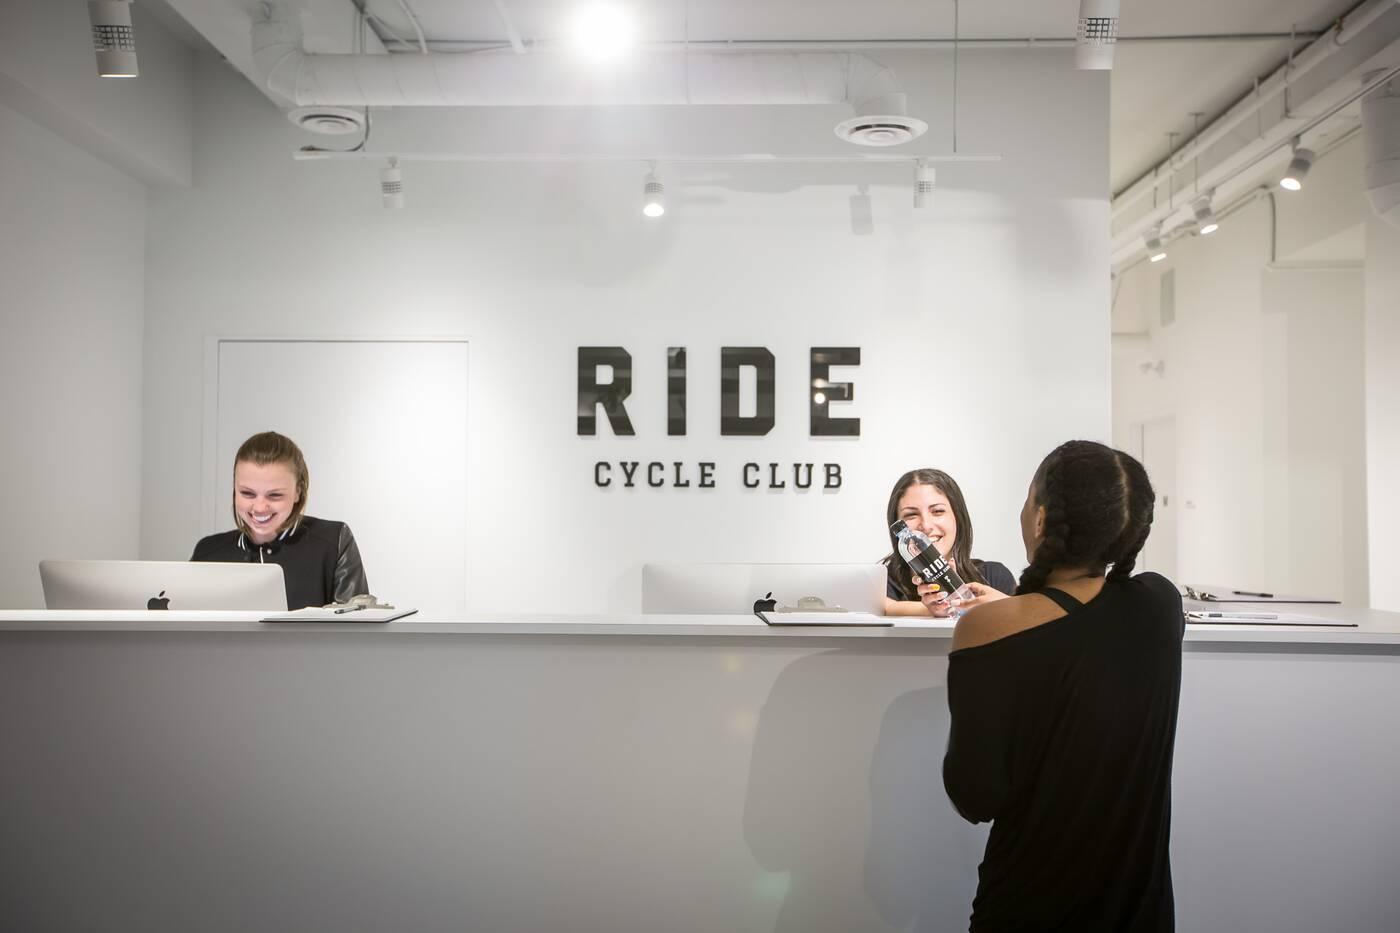 ride cycle club